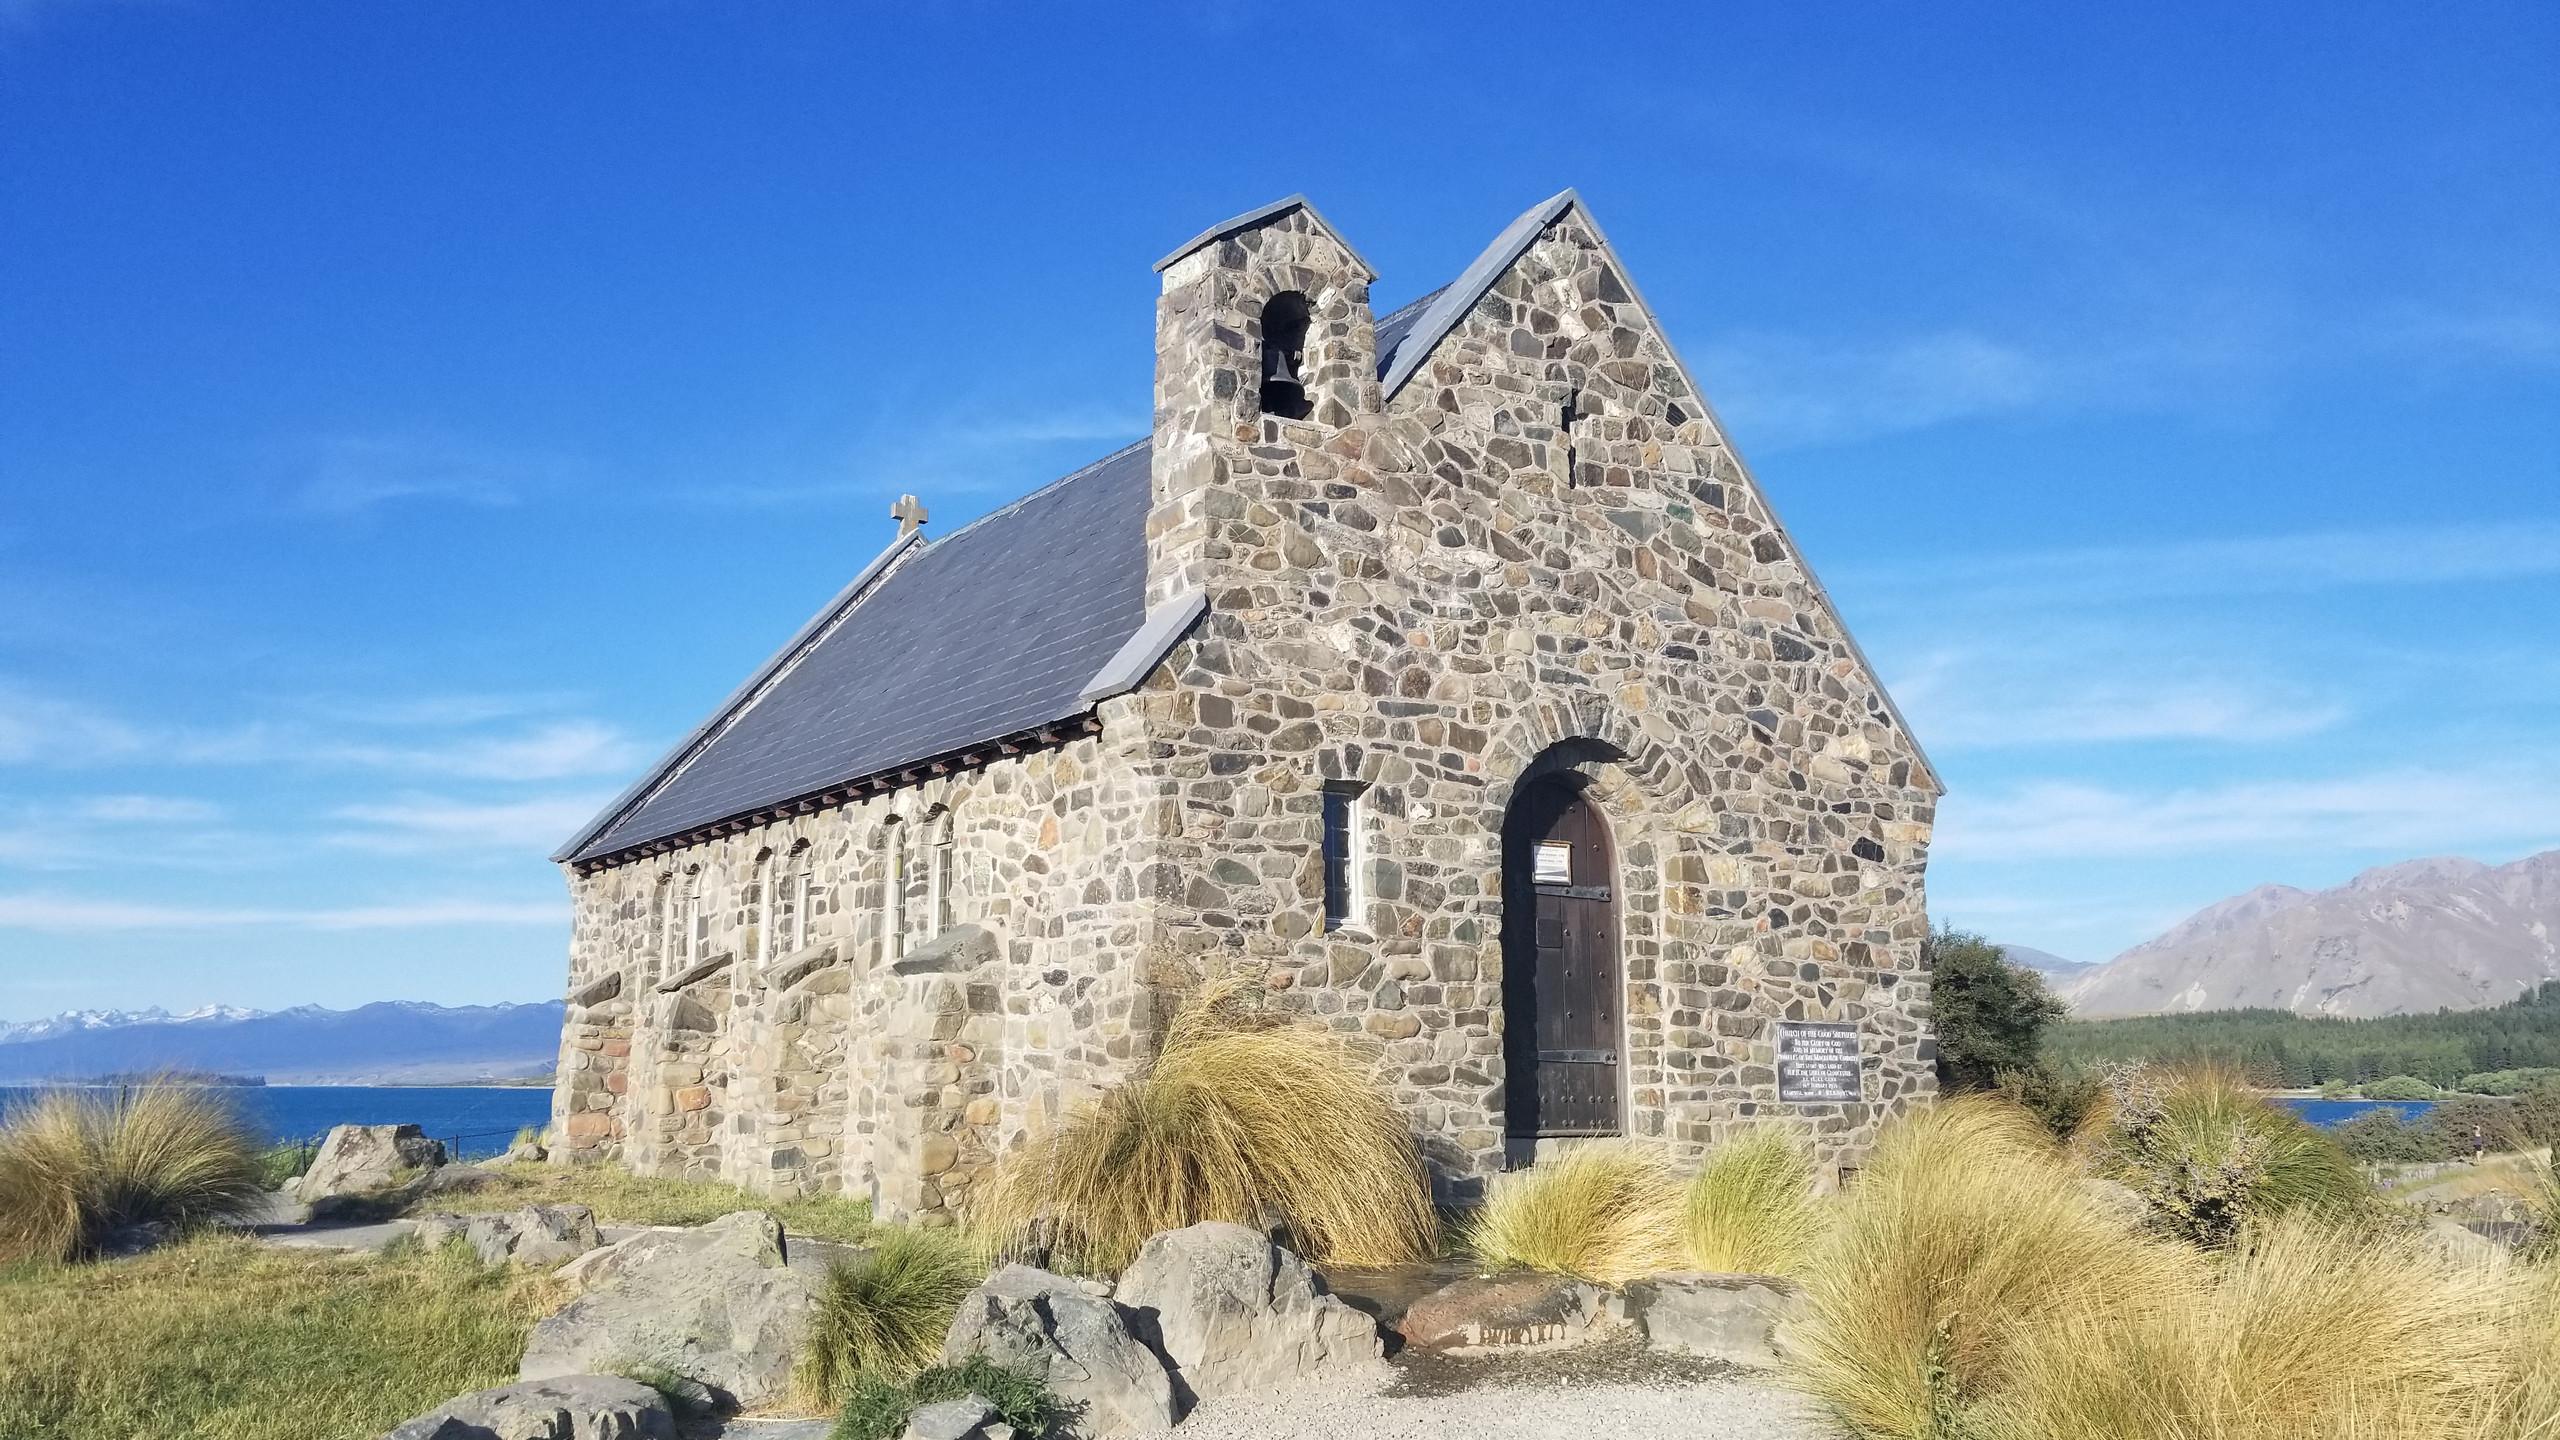 Church of the Good Shepherd lake Tekapo New Zealand